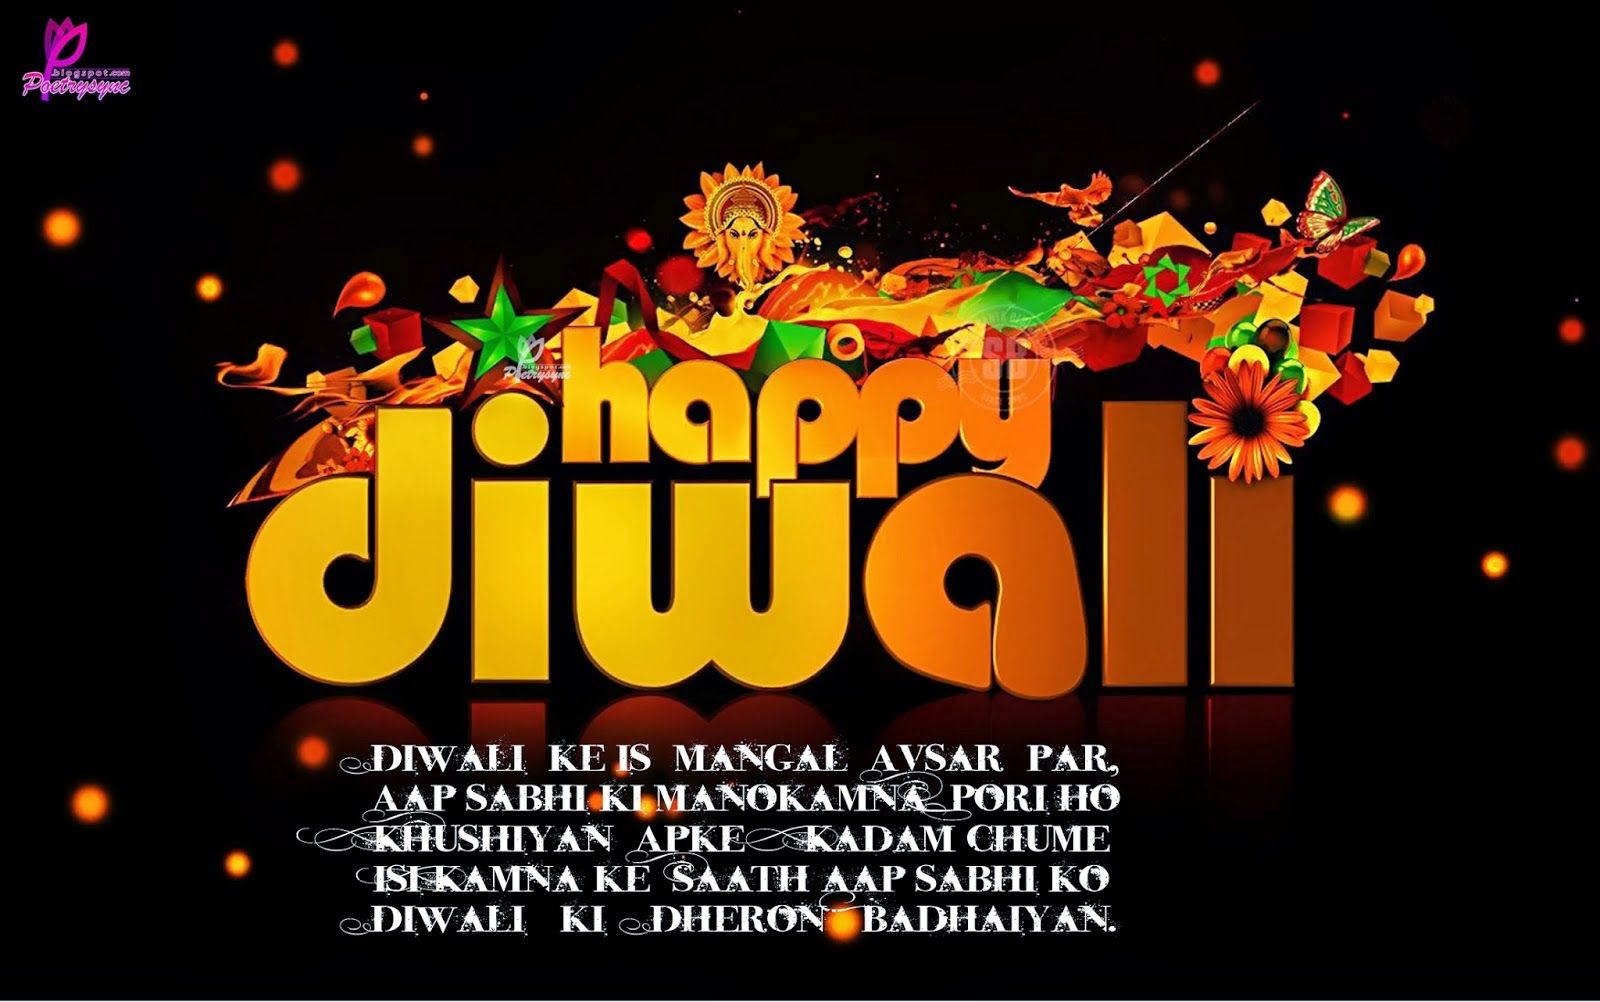 10 best happy diwali quote hd images httpfestivalworldz 10 best happy diwali quote hd images httpfestivalworldz altavistaventures Choice Image